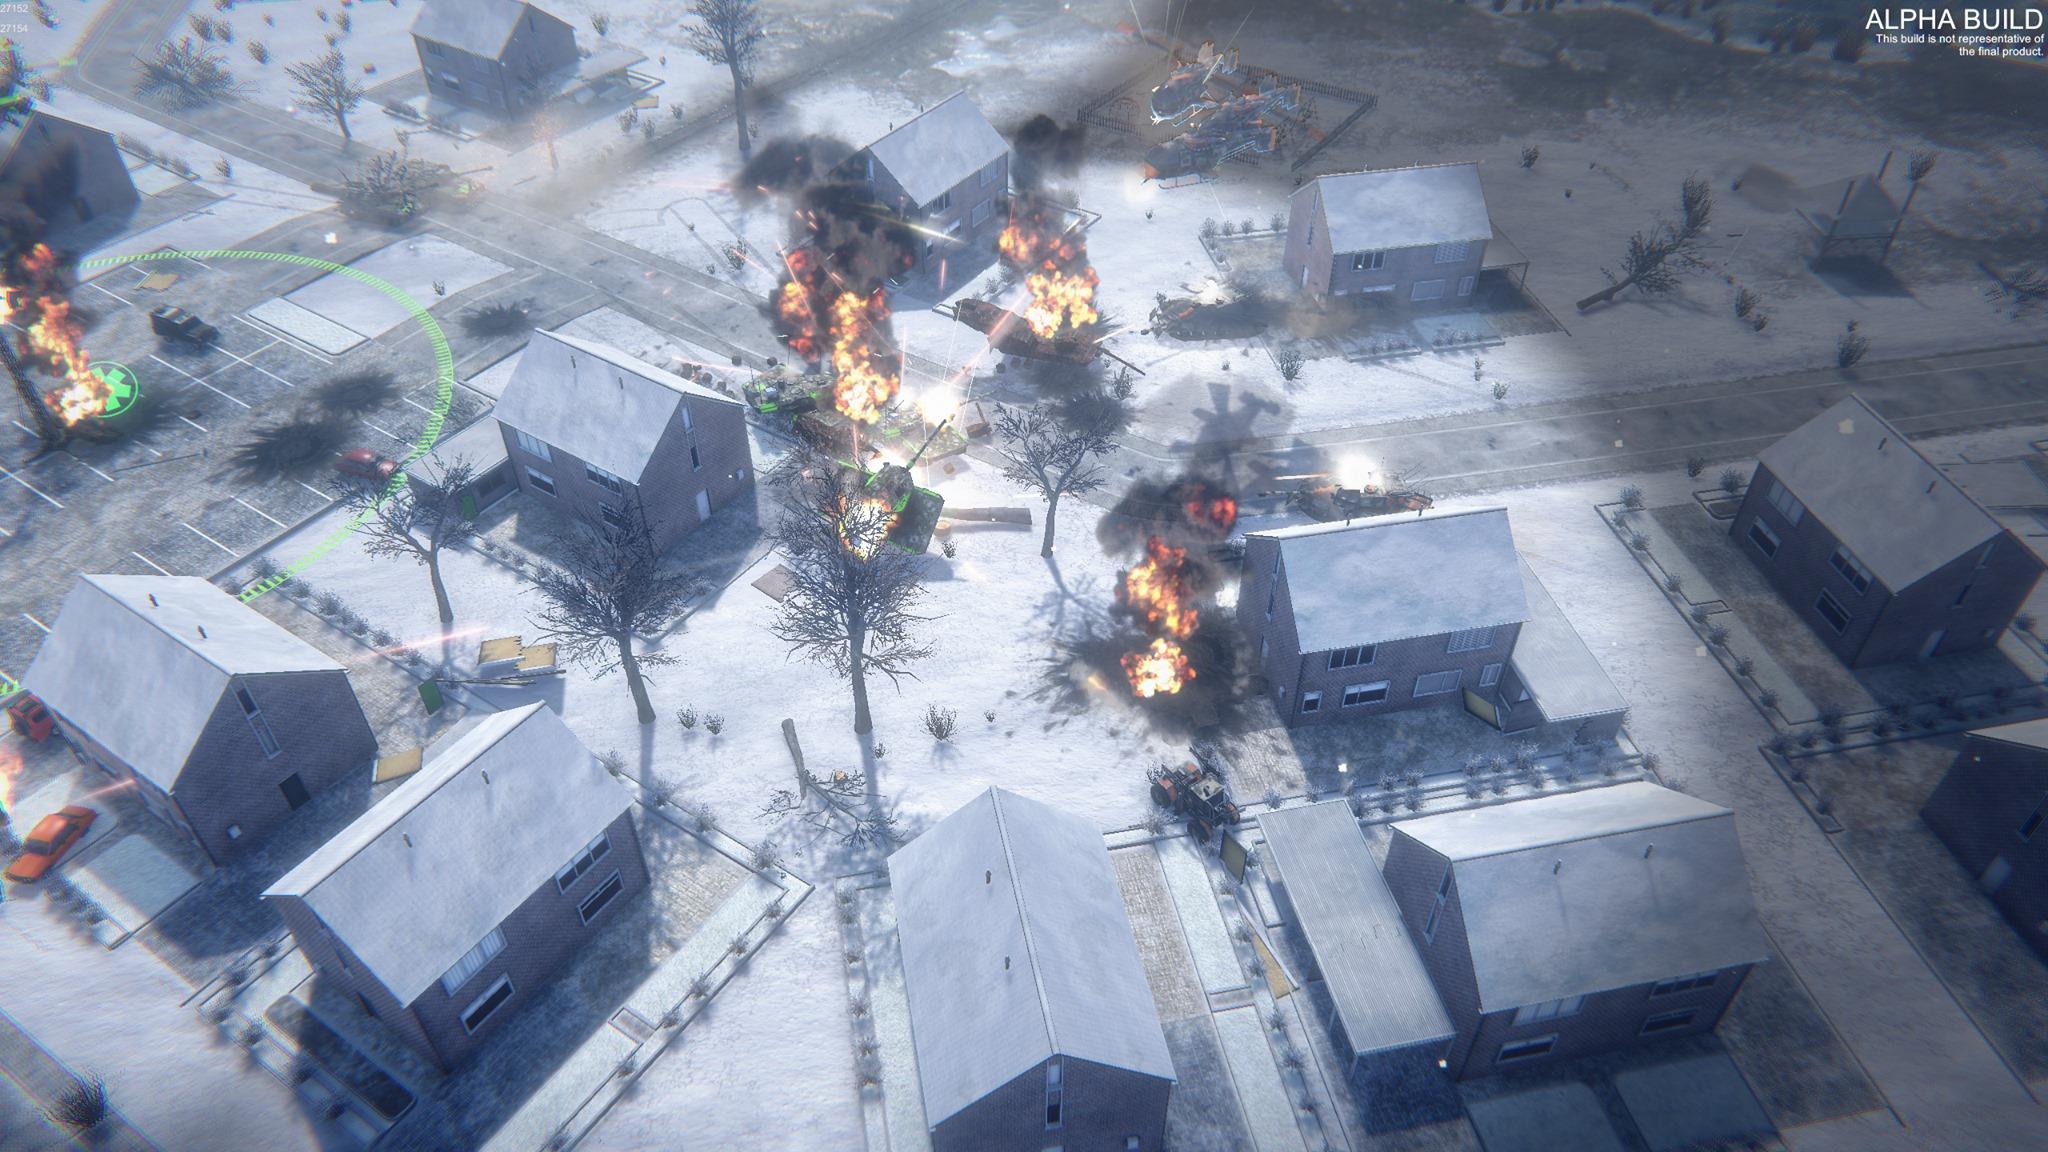 110228470 1373684306154605 6099827822533455830 o 7 Neue Screenshots zu Global Conflagration